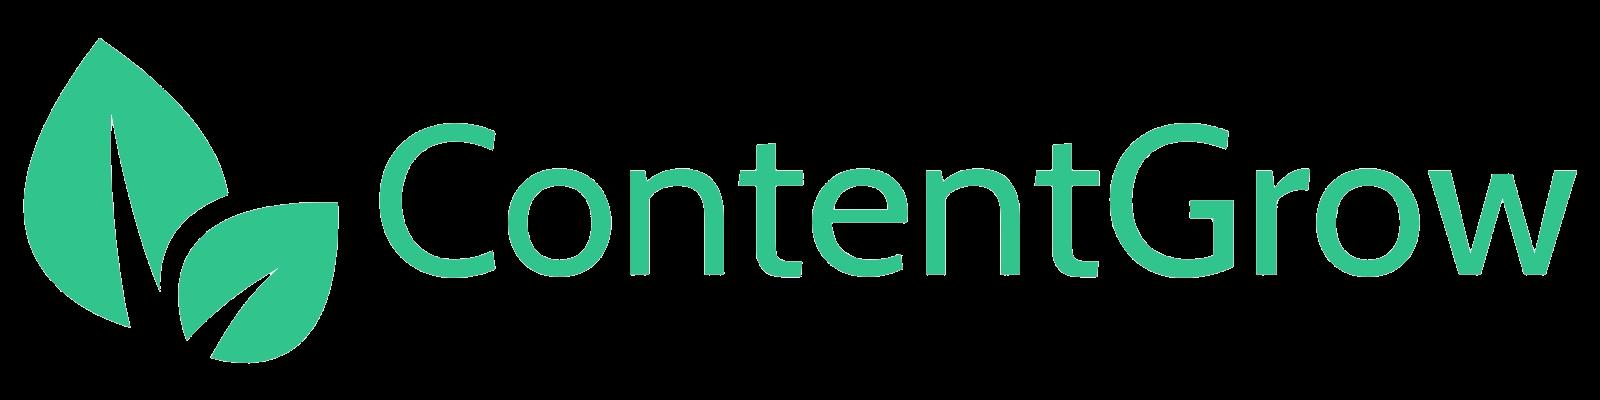 international press release distribution - contentgrow